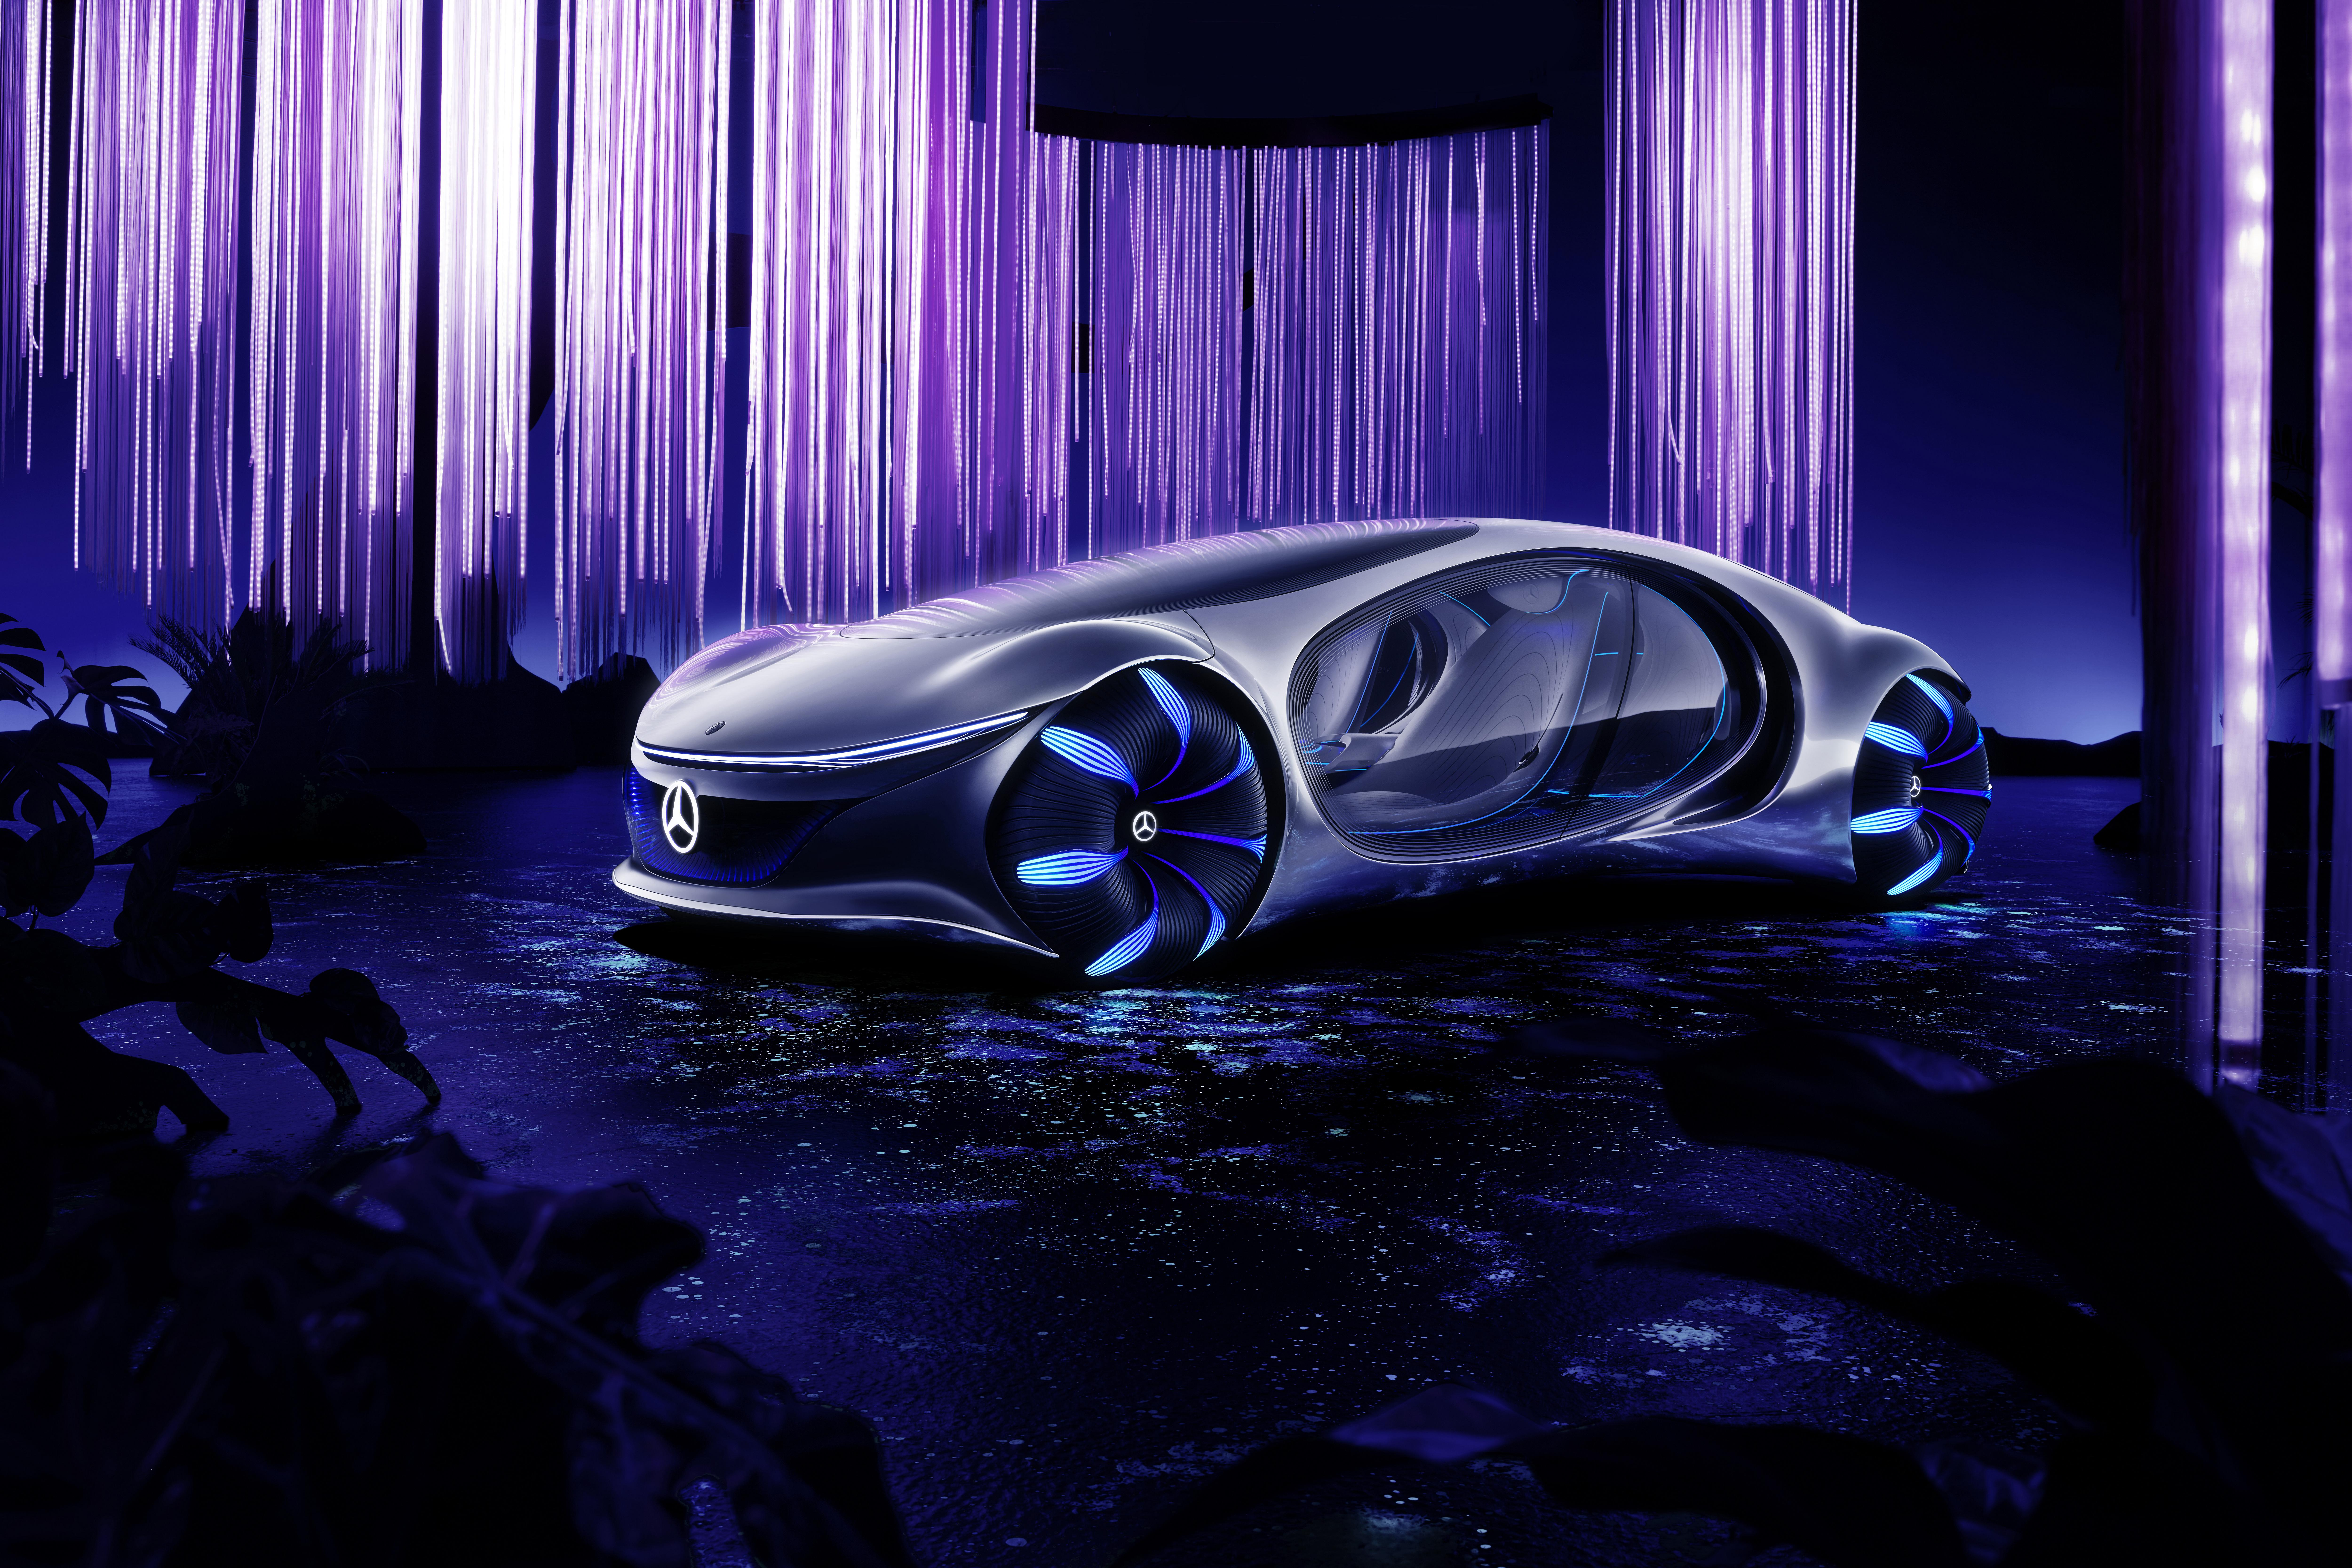 2020 mercedes benz vision avtr 1579649234 - 2020 Mercedes Benz Vision AVTR -